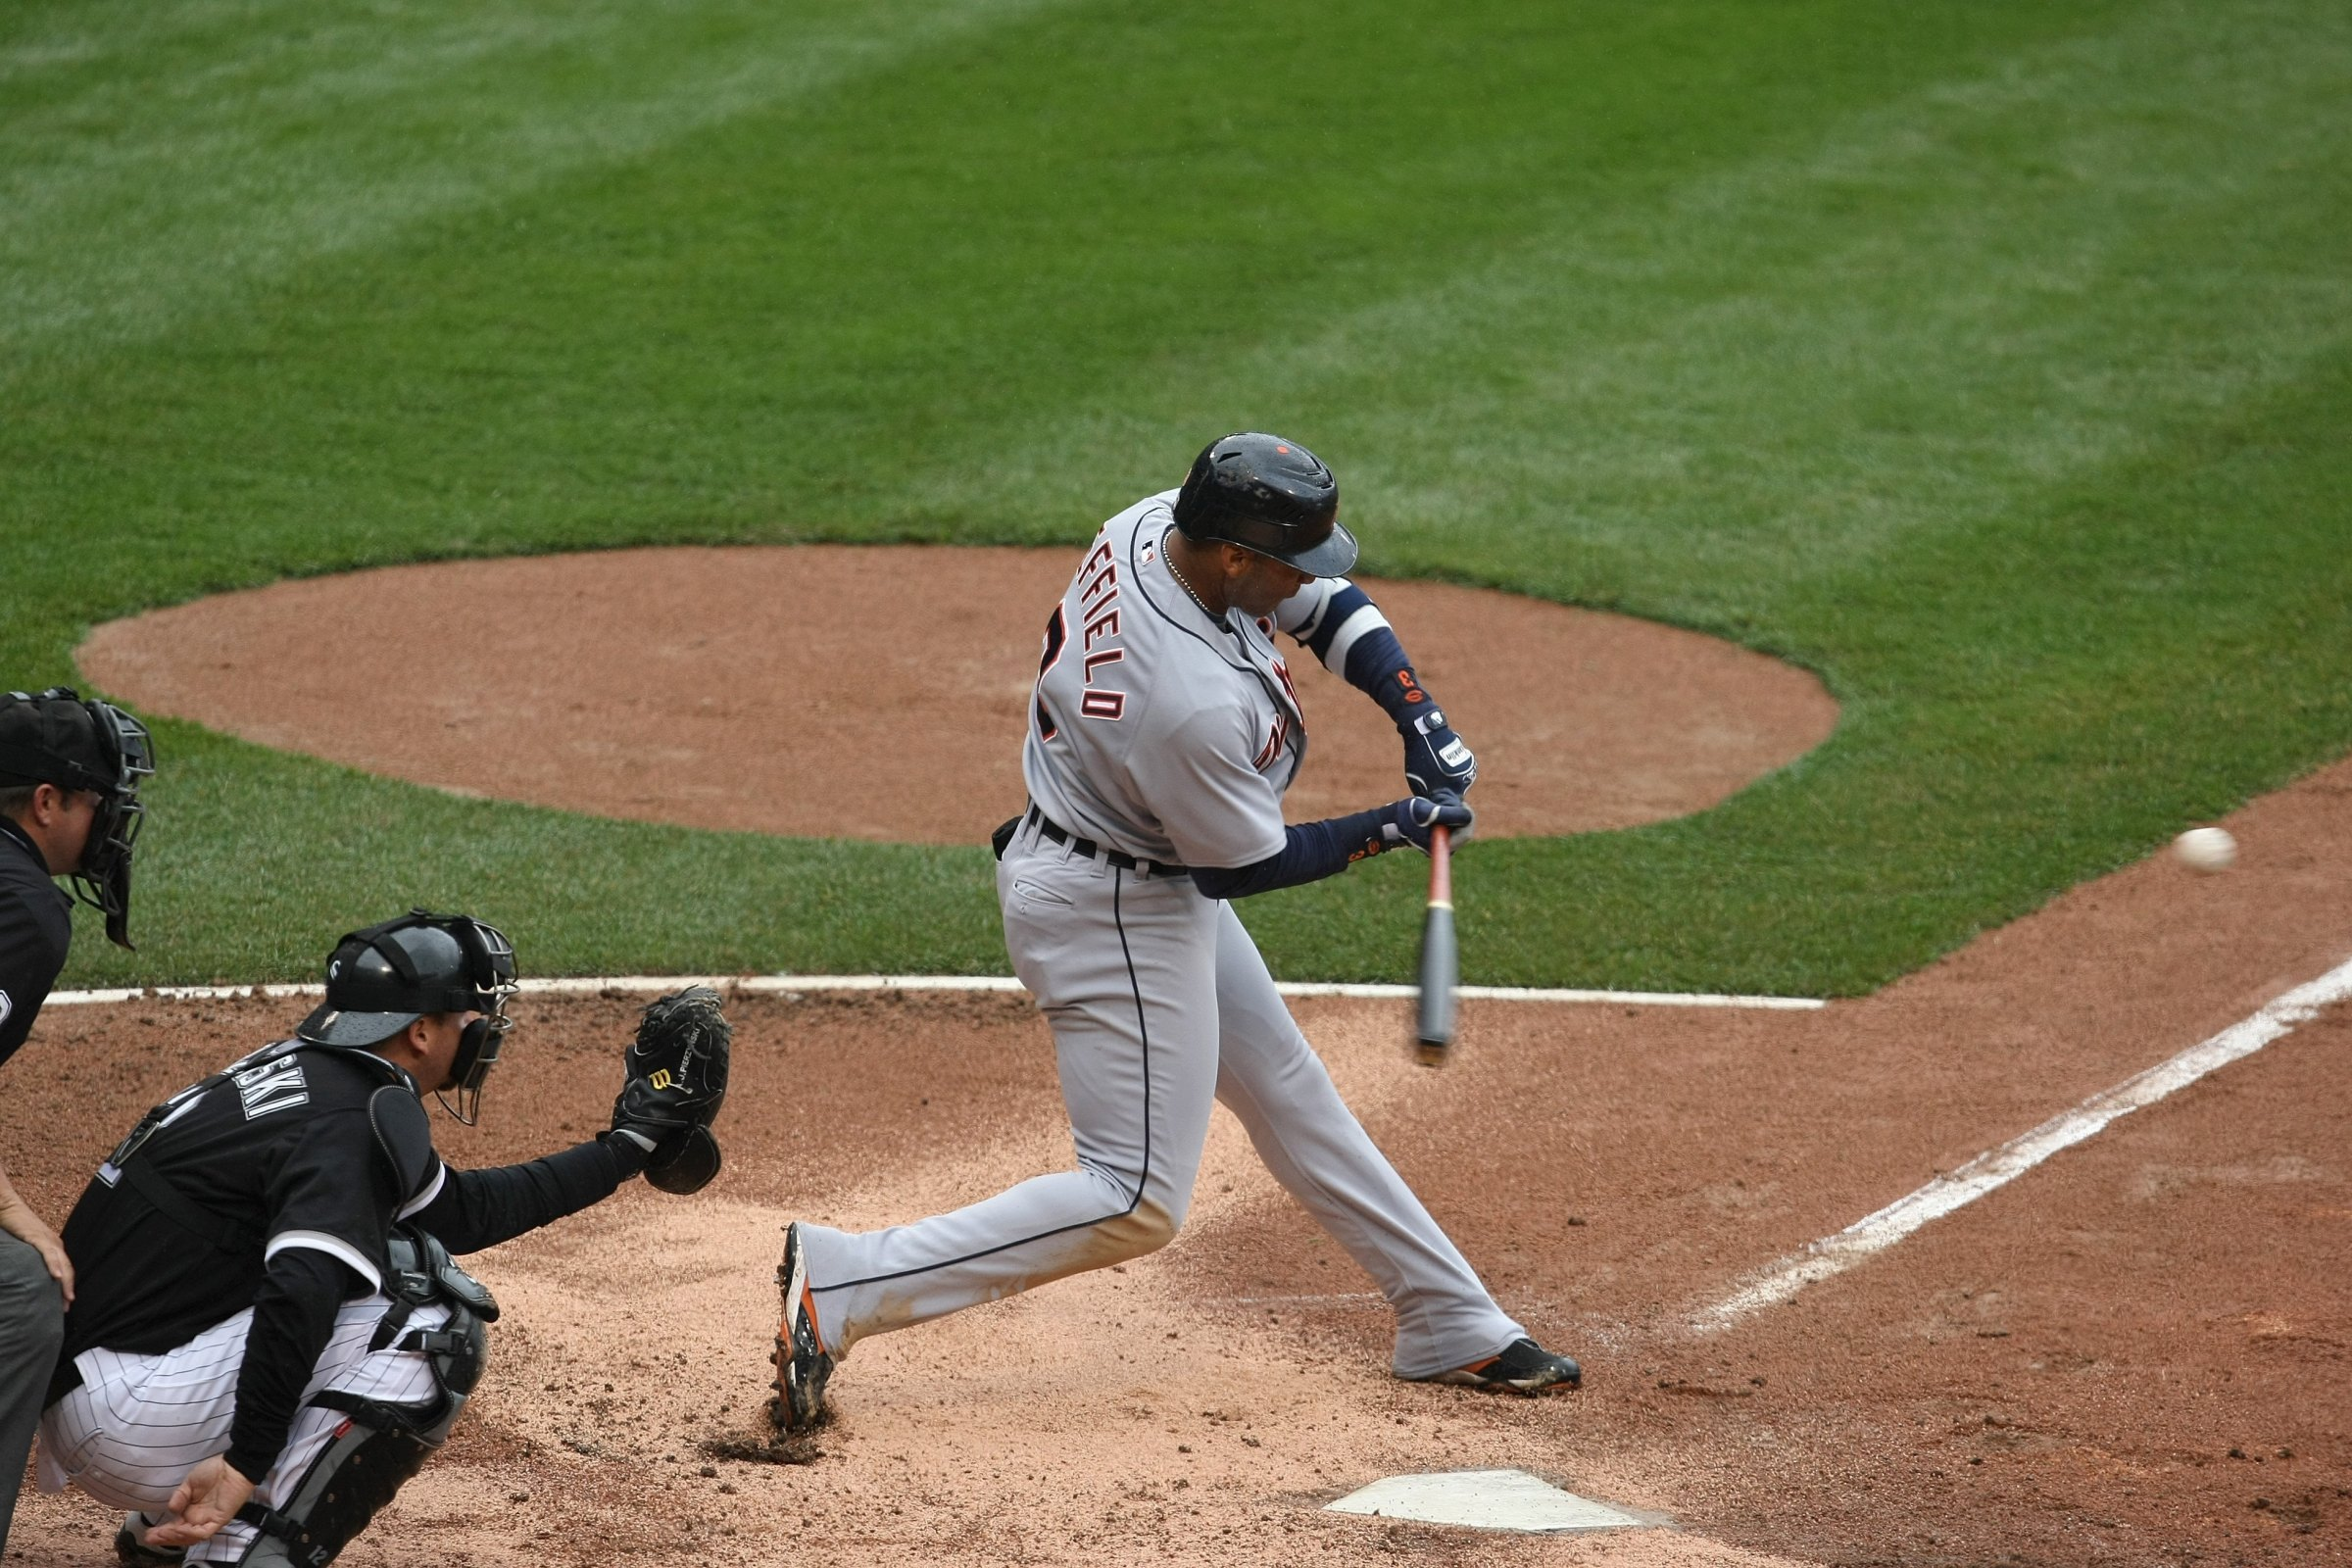 Gary Sheffield #3 of the Detroit Tigers bats